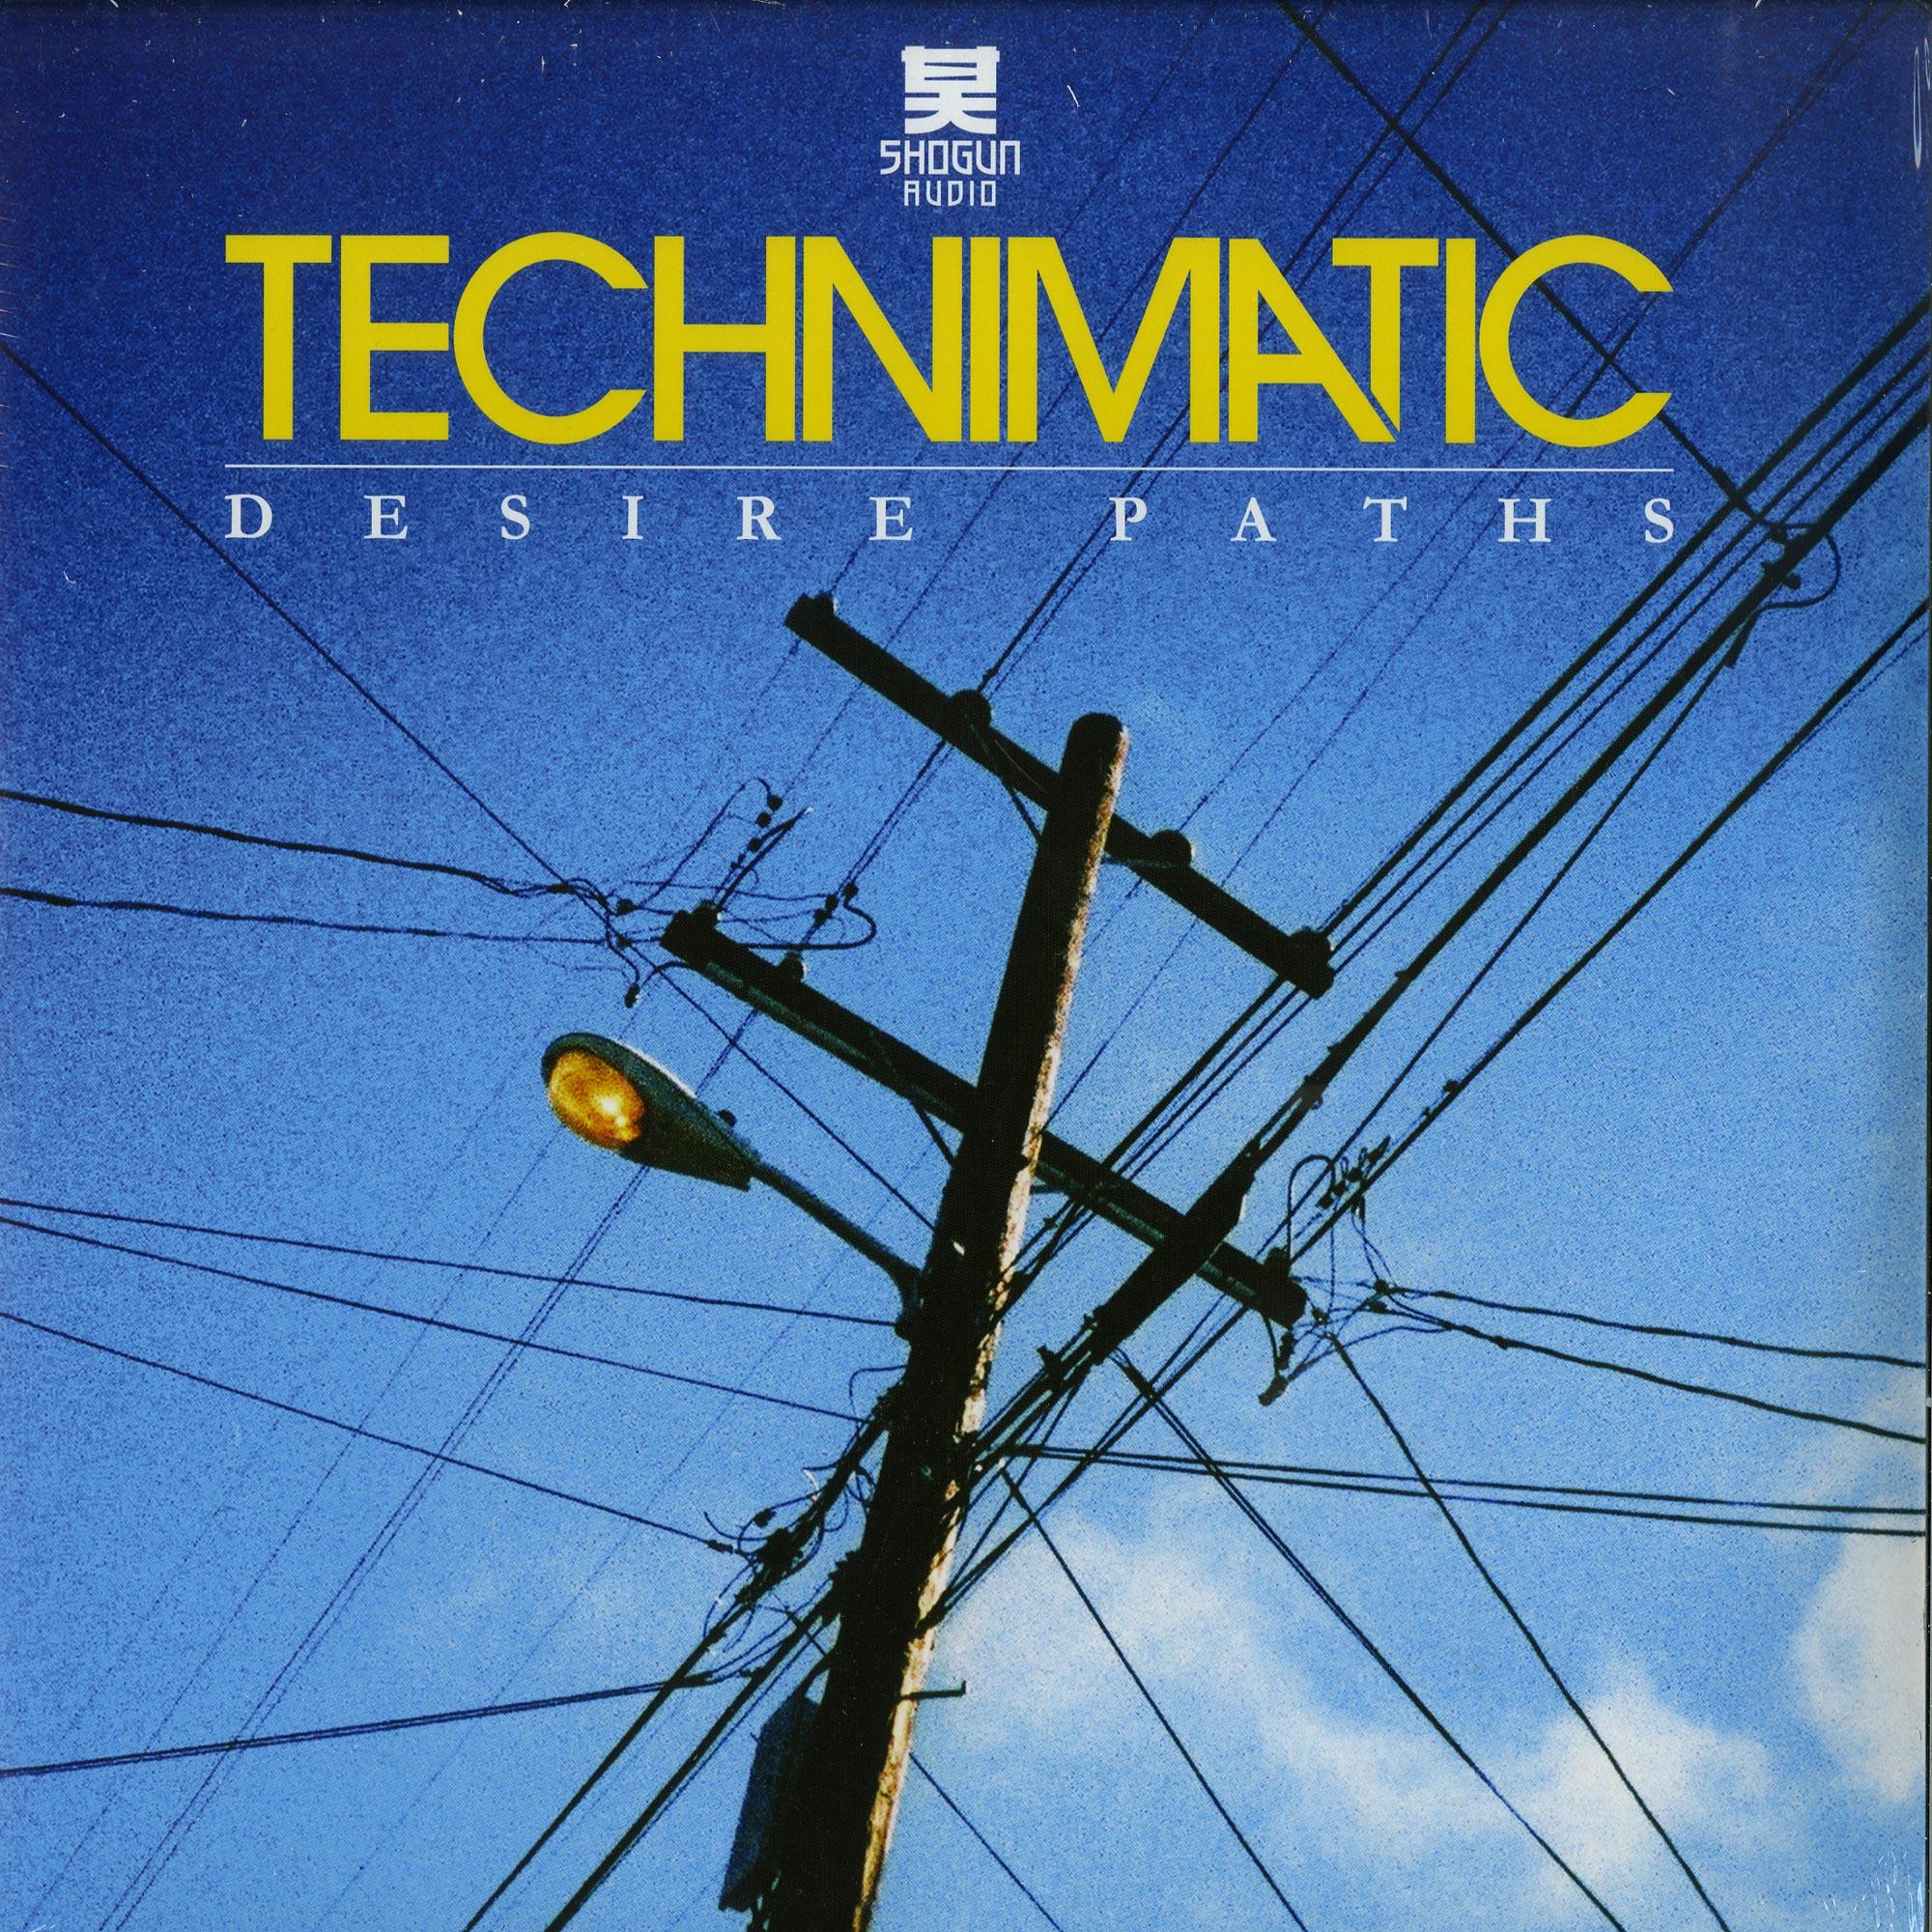 Technimatic - DESIRE PATHS